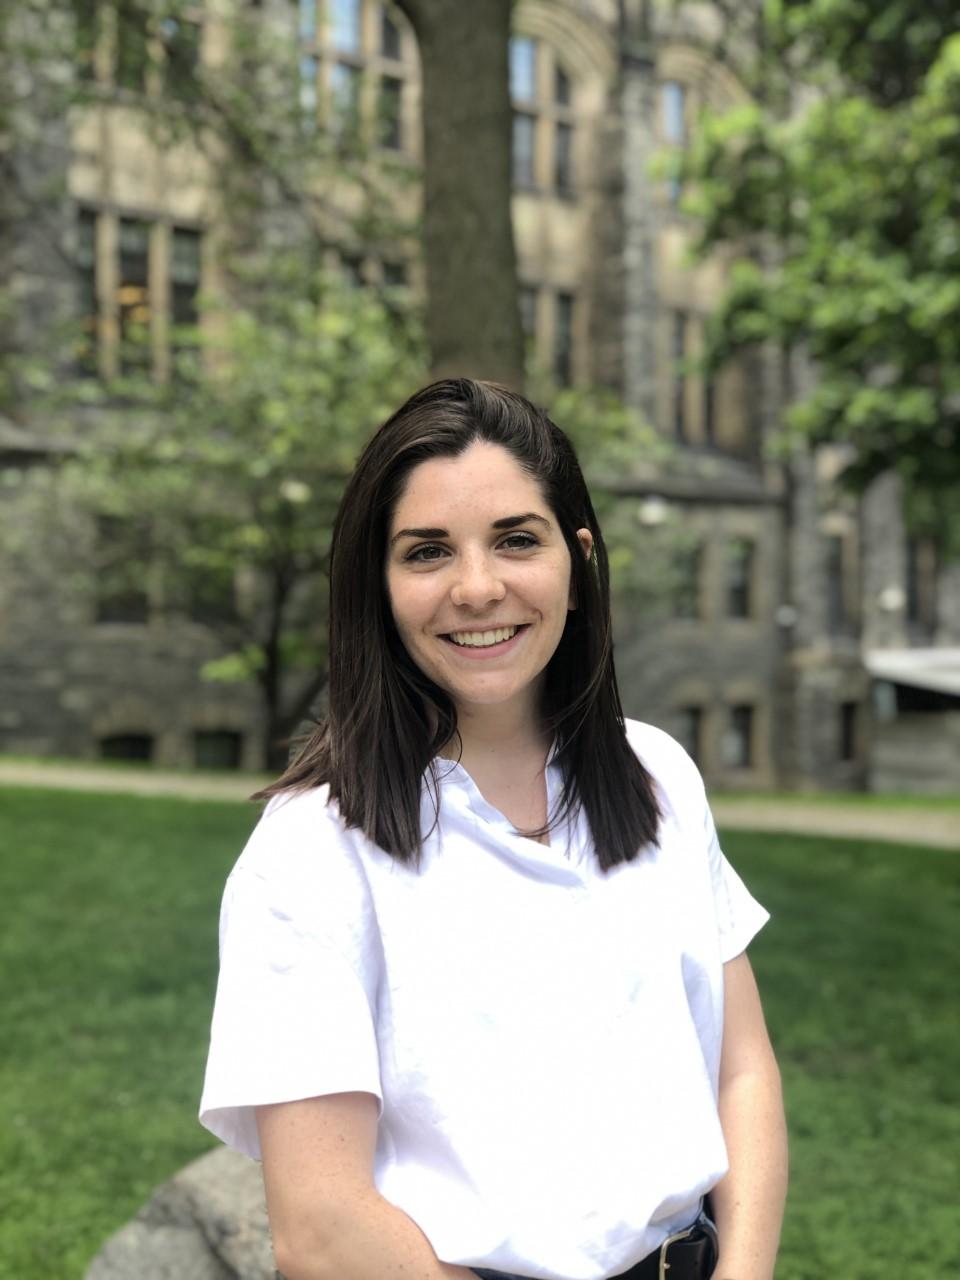 Erica DiFranco